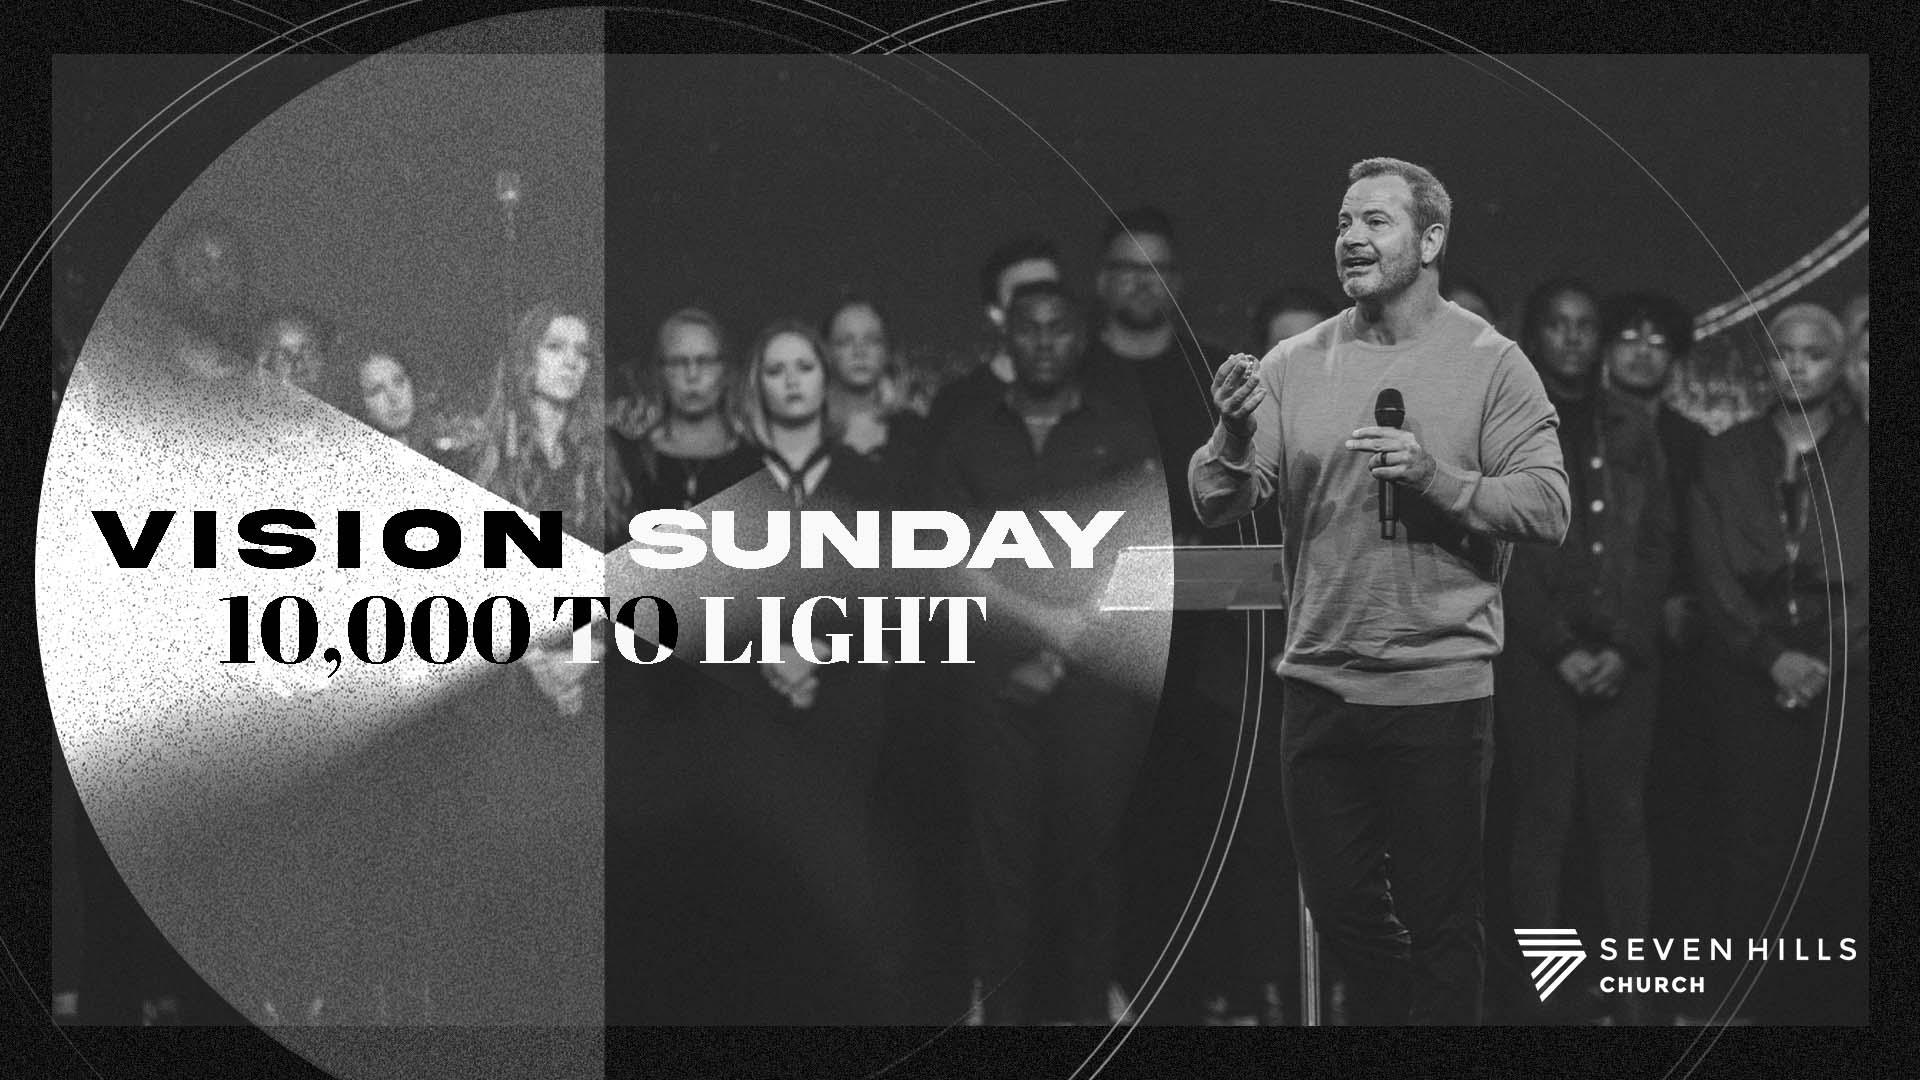 Vision Sunday 10,000 to Light